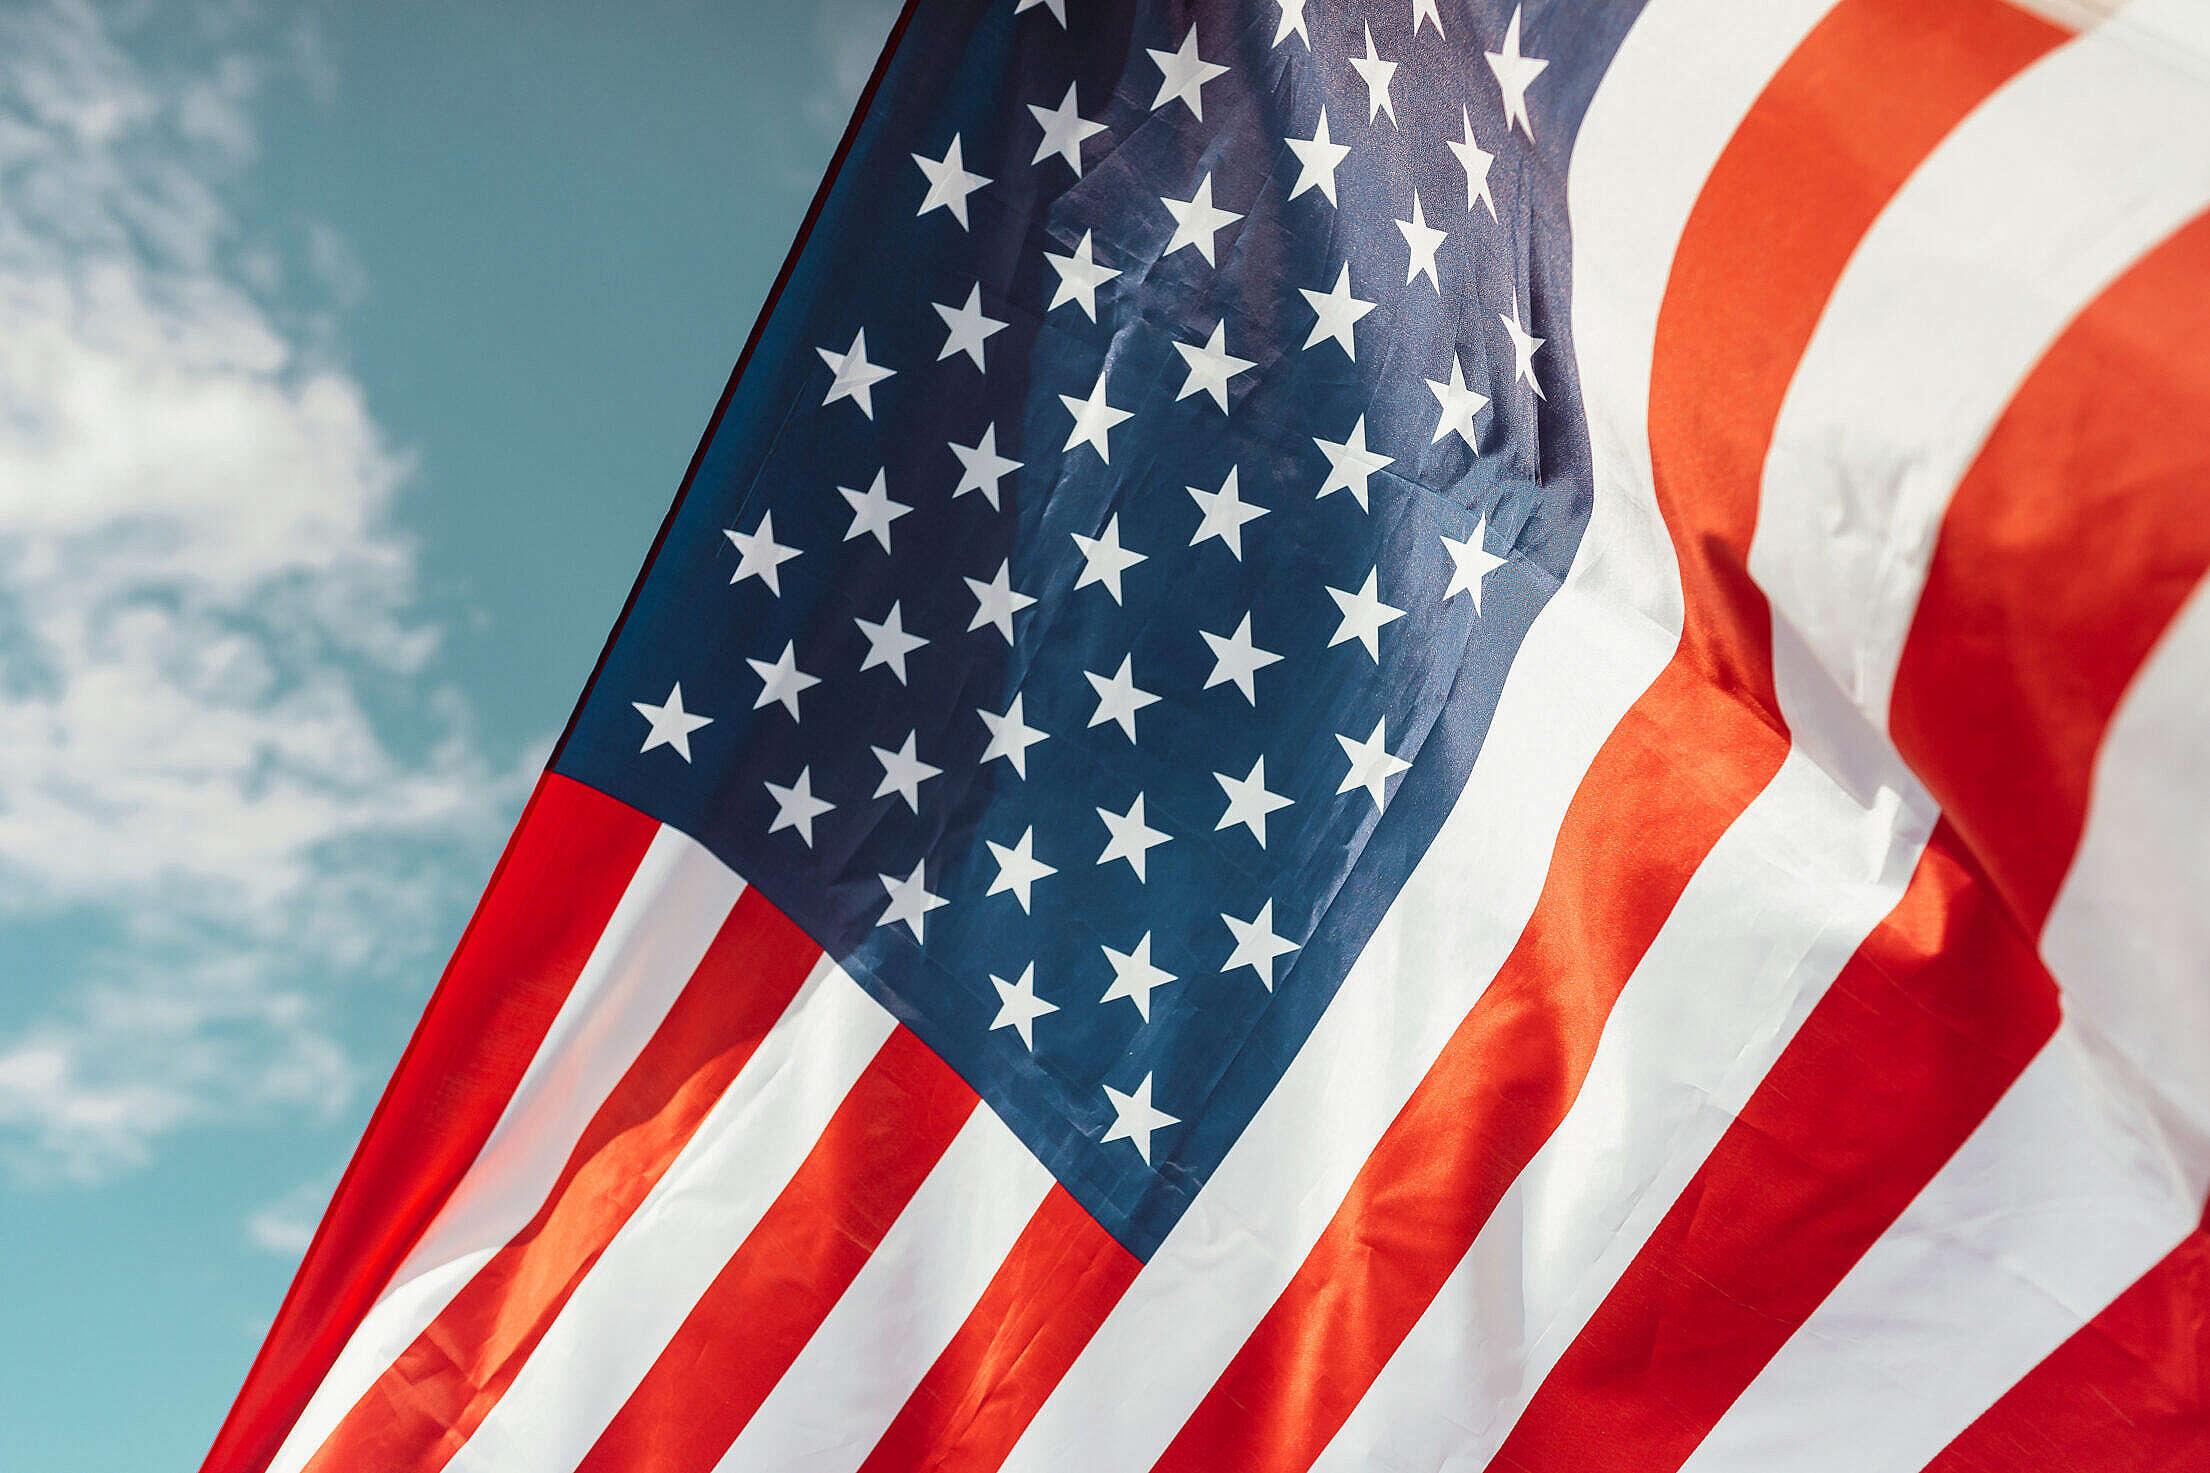 Flag of America Free Stock Photo